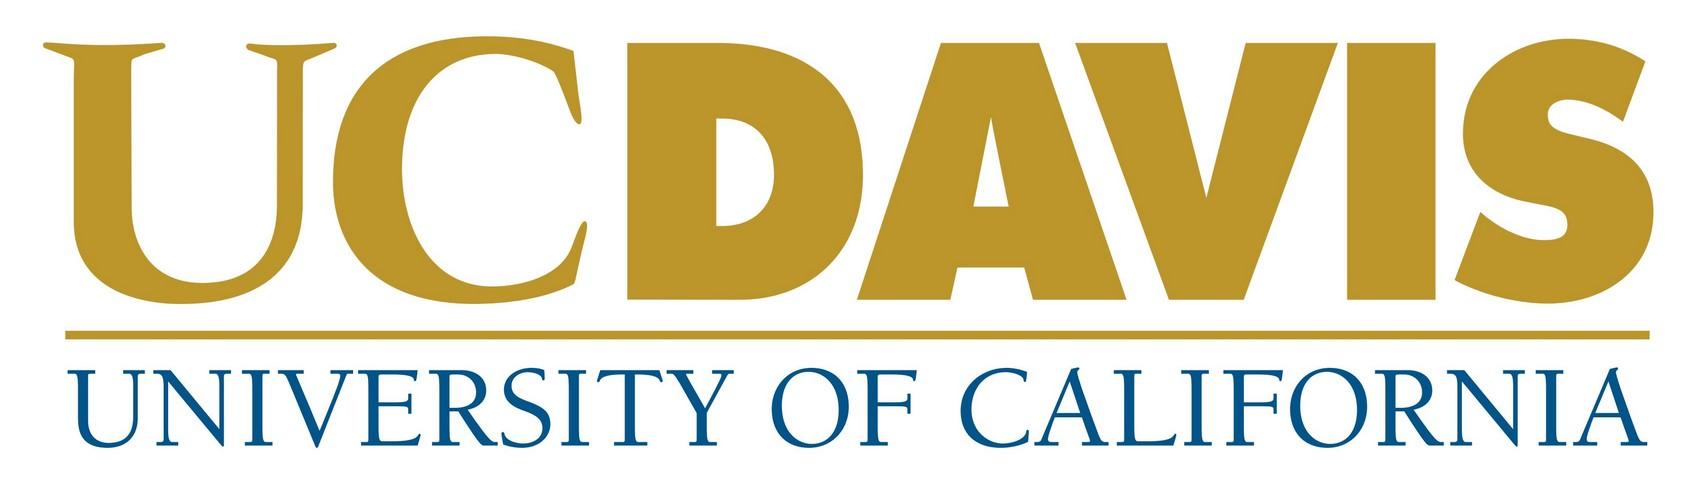 UC-Davis-1585418929.jpg